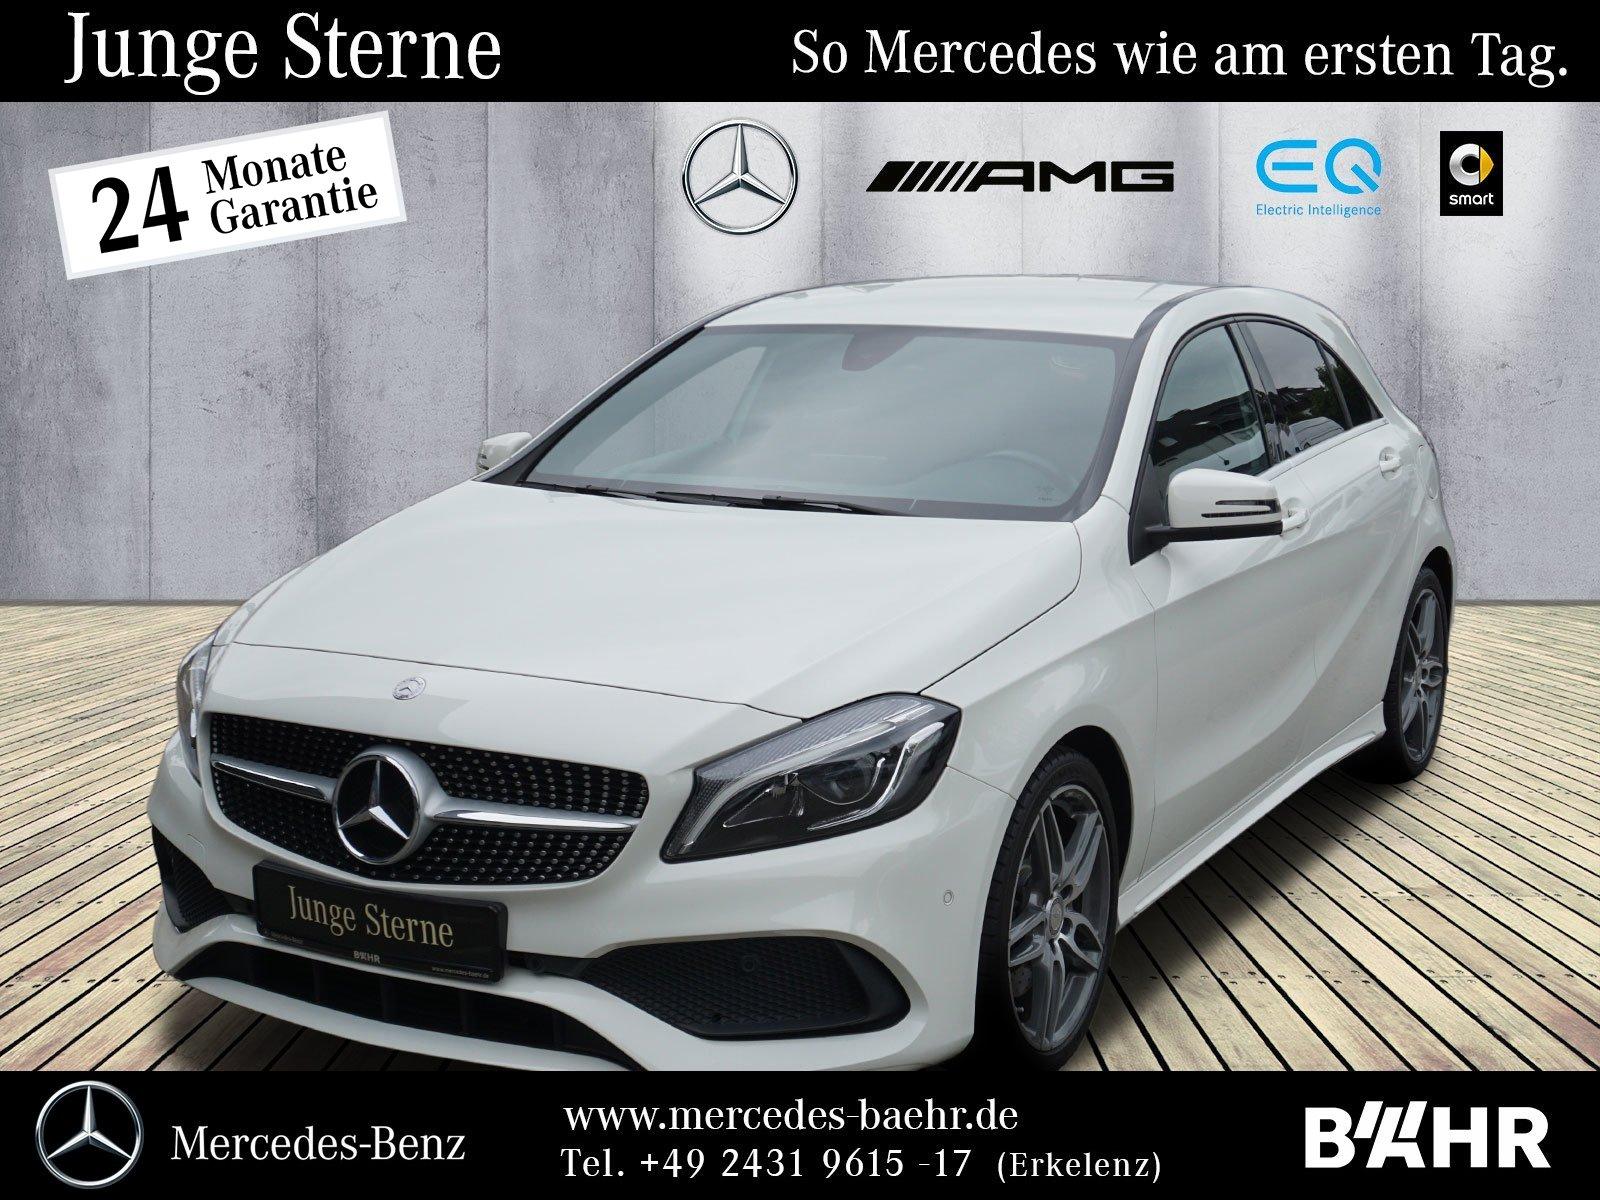 "Mercedes-Benz A 220 d AMG/Navi/LED/HarmanKardon/Park/LMR-18"", Jahr 2017, diesel"